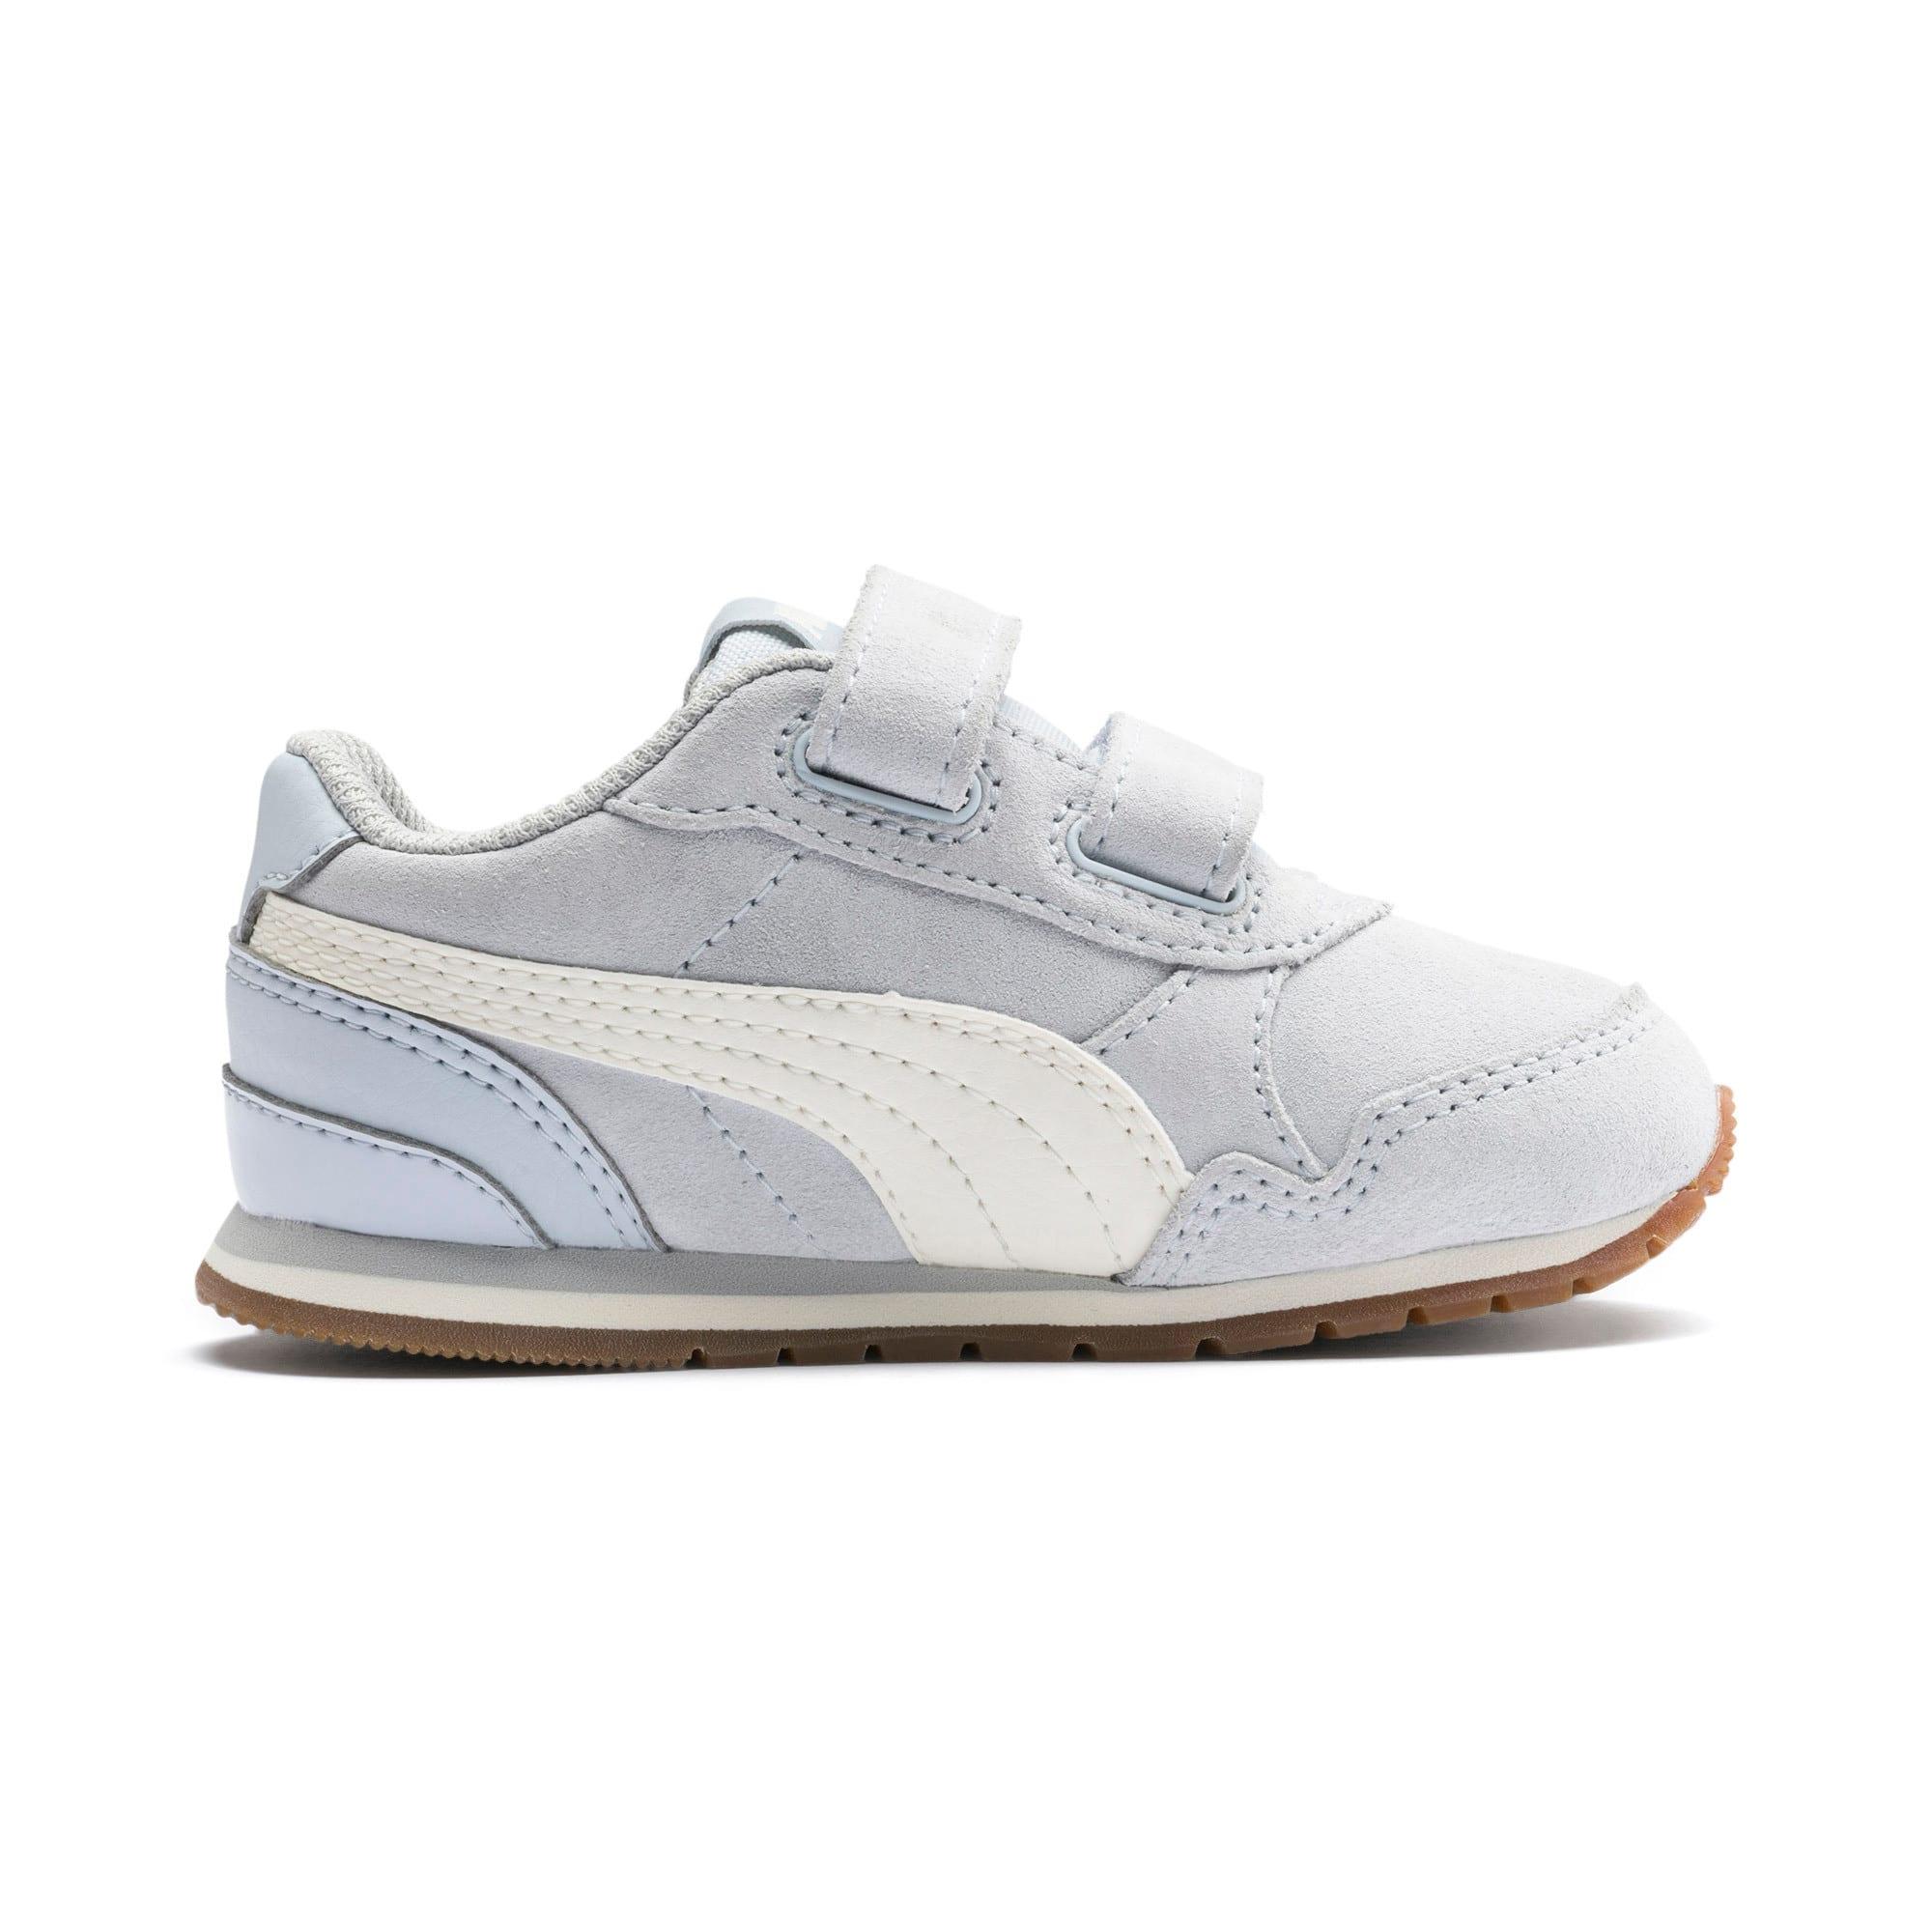 Miniatura 5 de Zapatos ST Runner v2 Suede para bebé, Heather-Whisper White, mediano